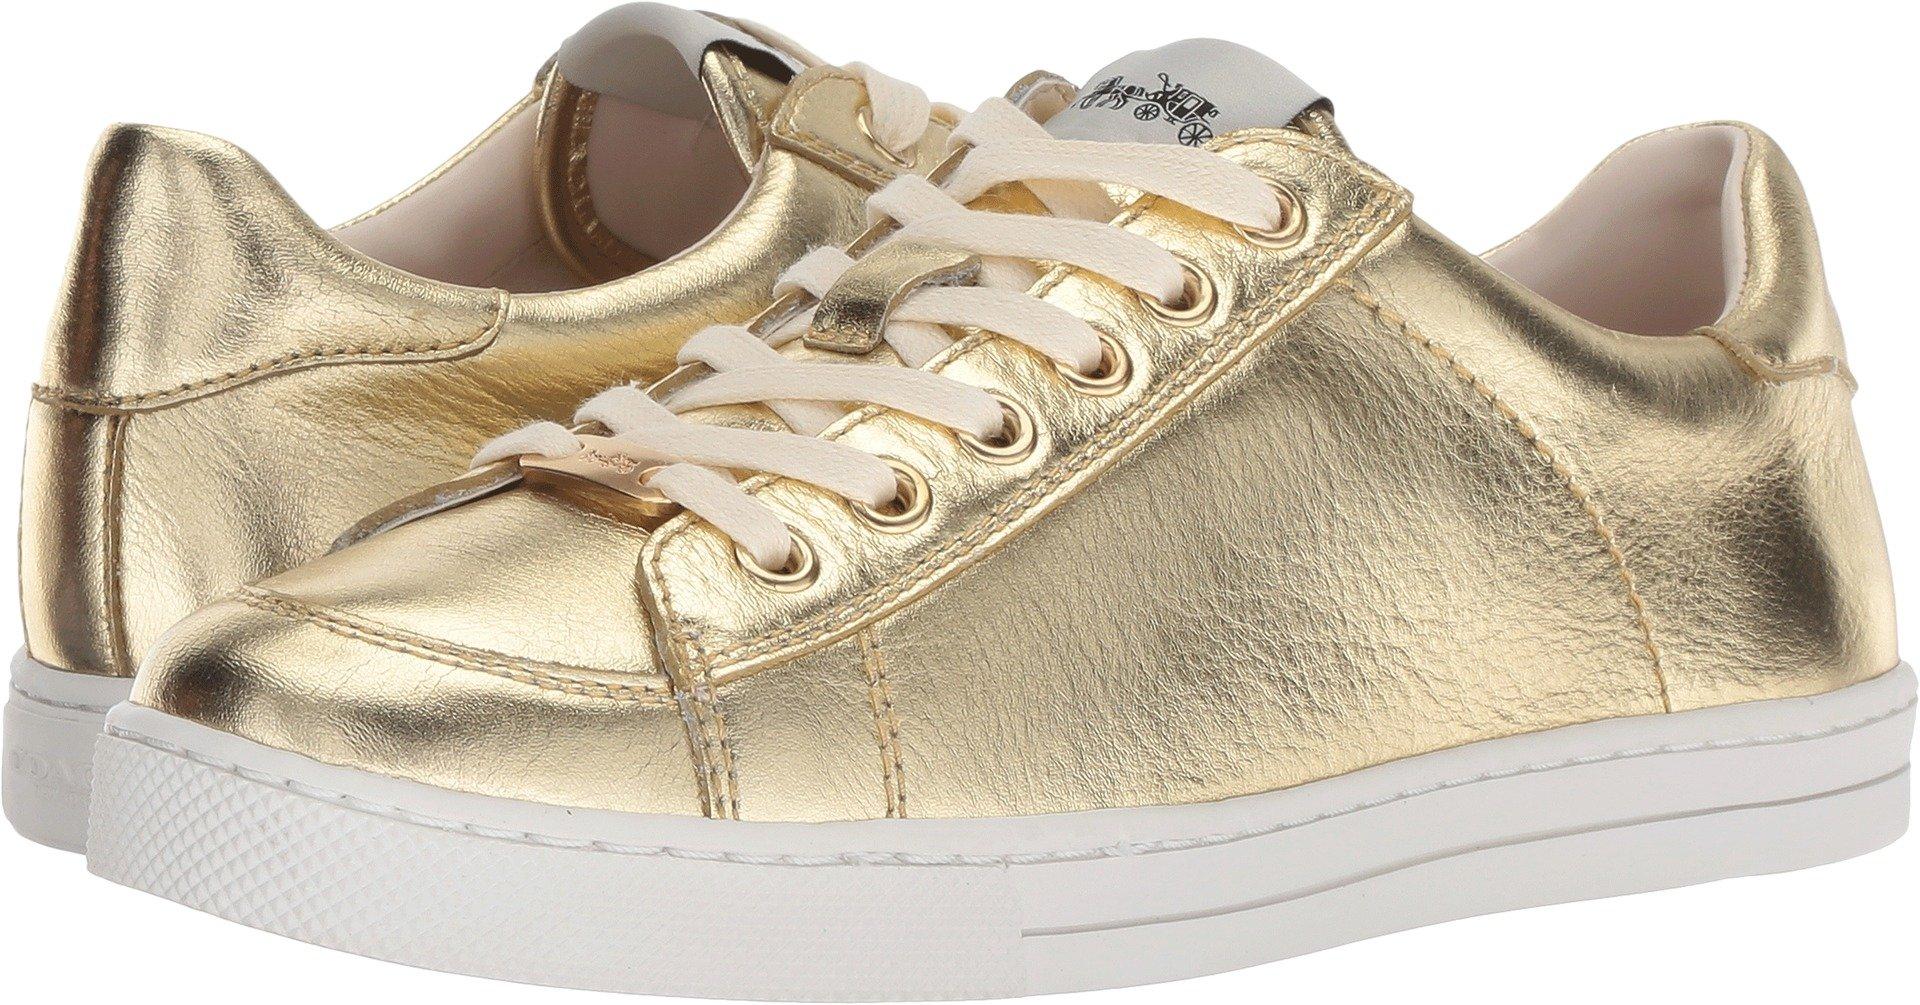 Coach Women's C126 Low Top Sneaker Gold Metallic Leather 7 M US